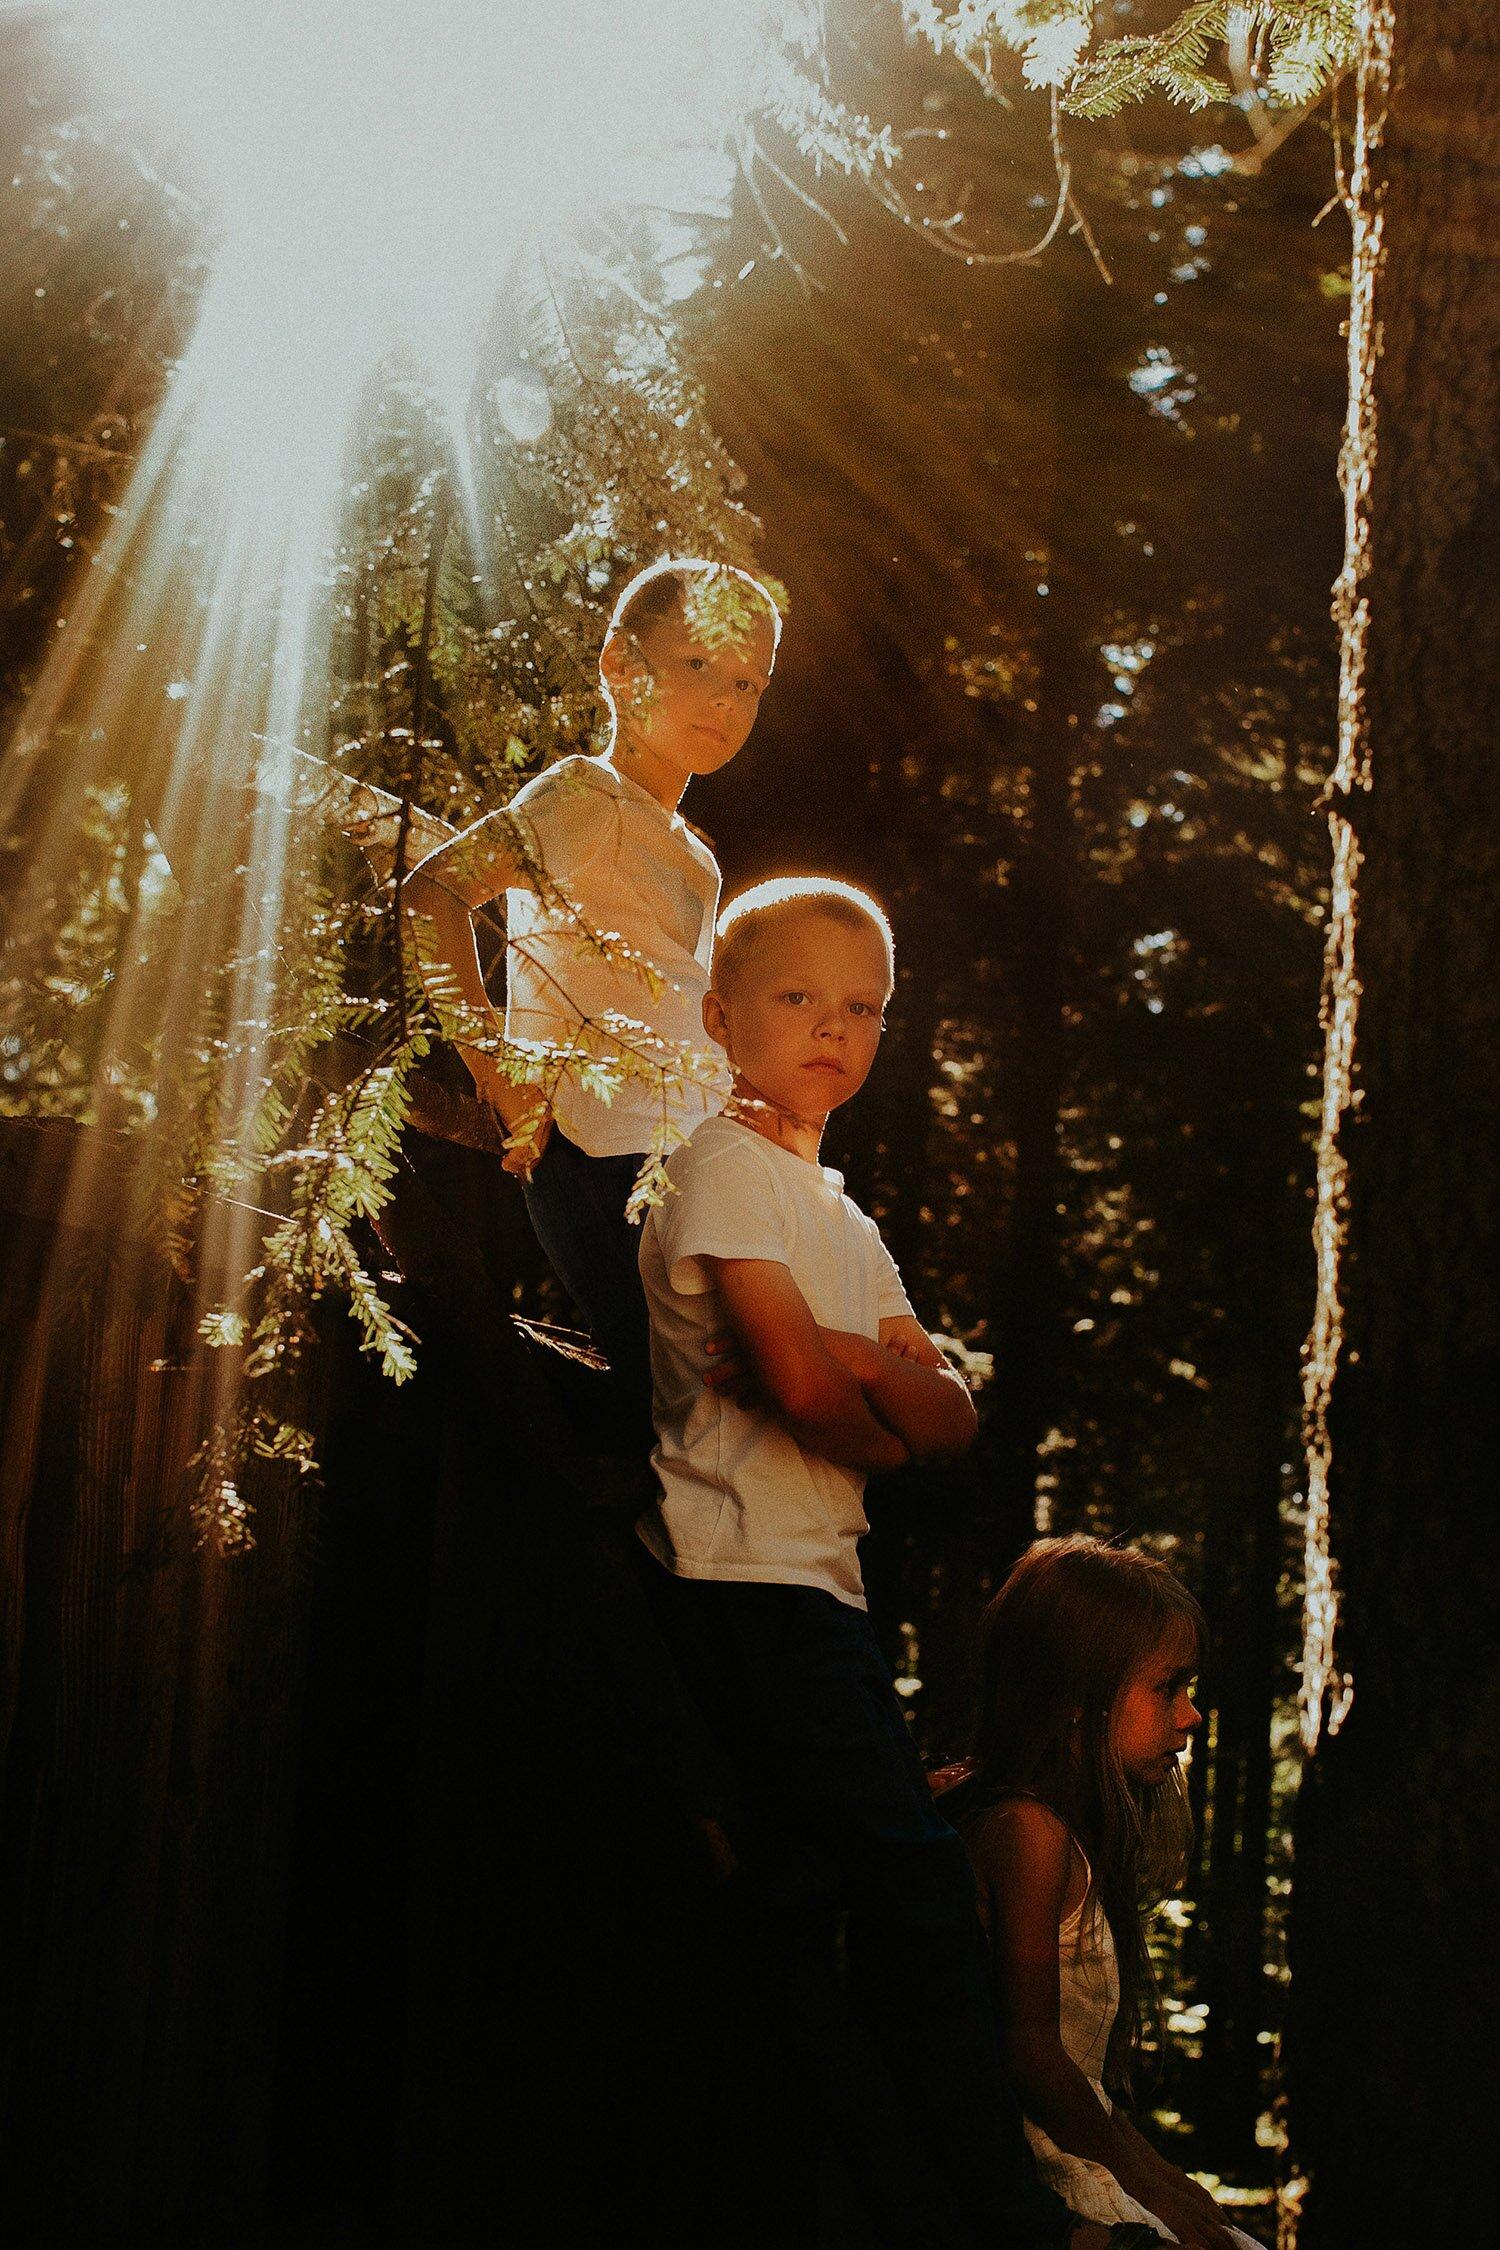 sesja rodzinna naturalna w lesie 34